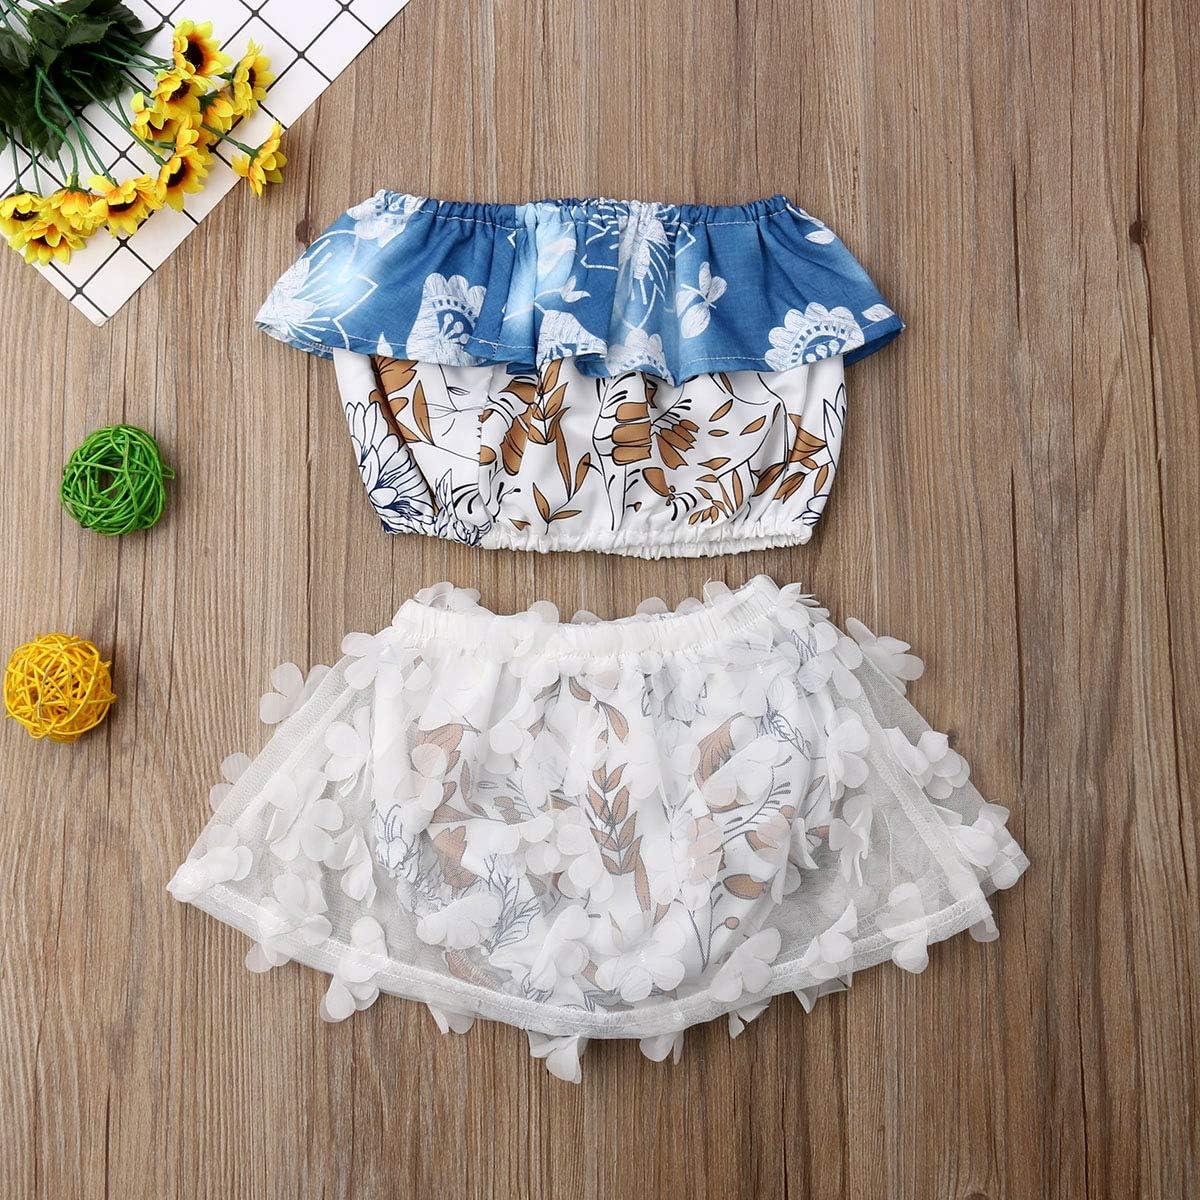 Newborn Kids Clothing Baby Girls Cute Ruffle Flower Vest Tank Top+Lace Bottom Shorts Pants 2Pcs Outfits Clothes Set